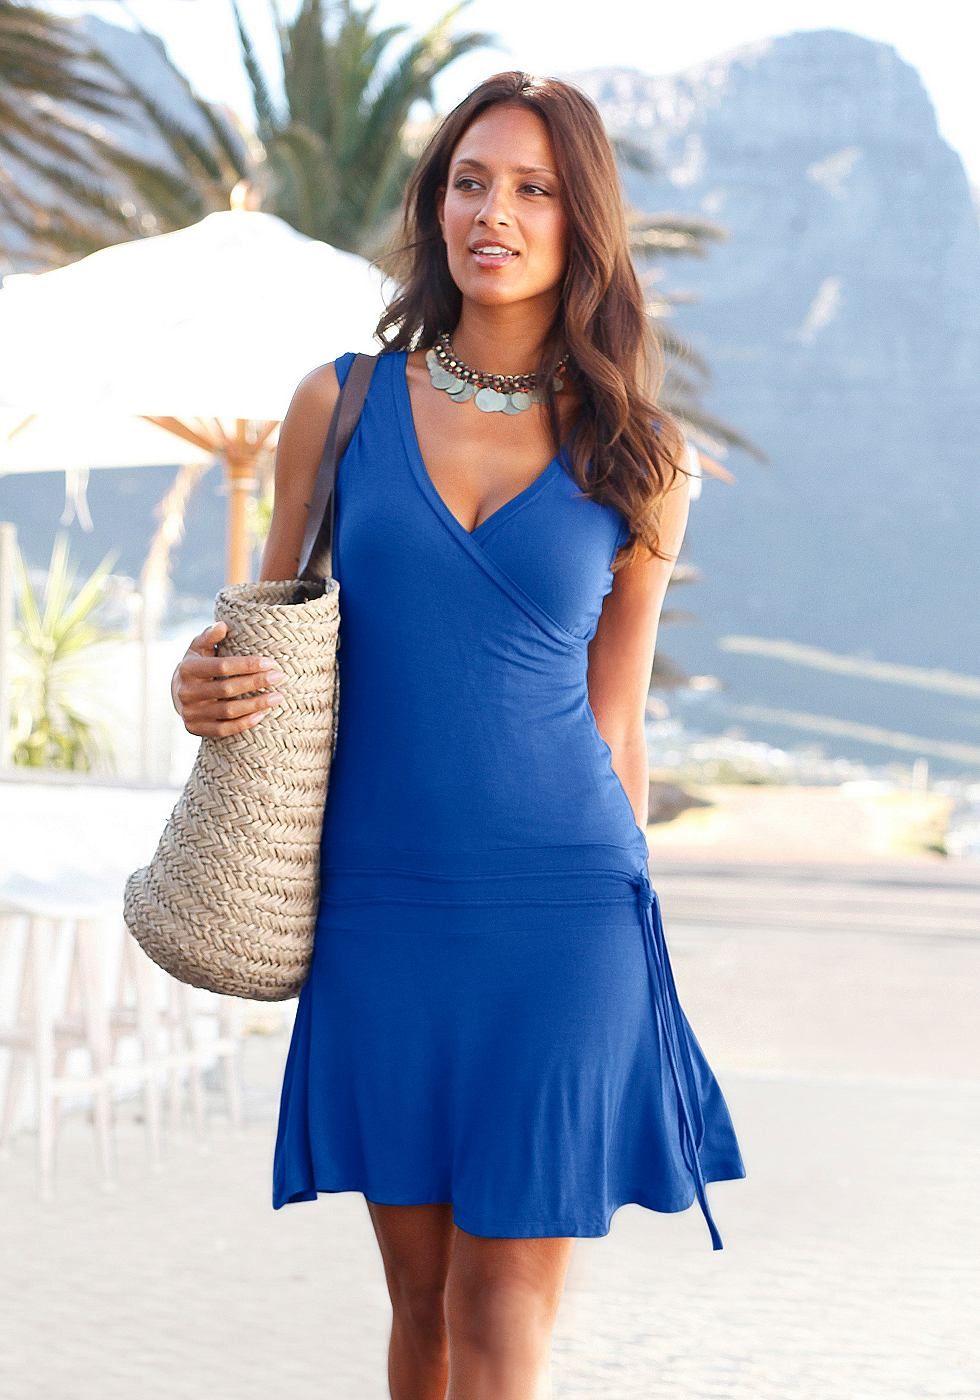 Beachtime Strandjurk in wikkel-look blauw